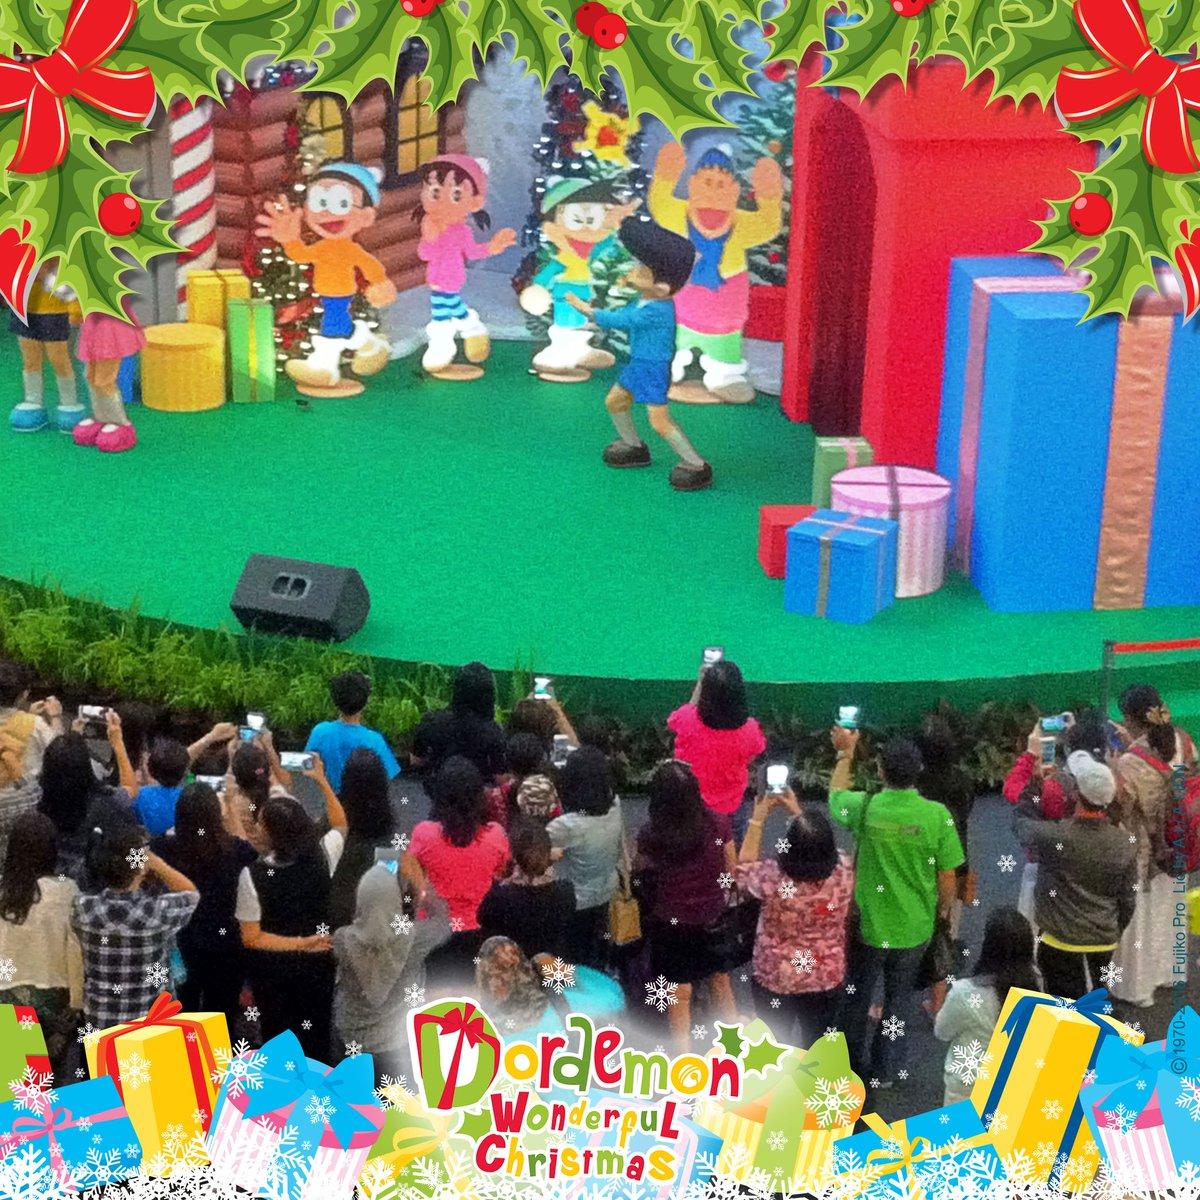 Ayo segera berkumpul di The Forum MKG 3!  Kalian bisa bertemu dengan Doraemon & Teman-Teman, loh!  #ILoveDoraemon #DoraemonIndonesia https://t.co/o8y1Do5QXG